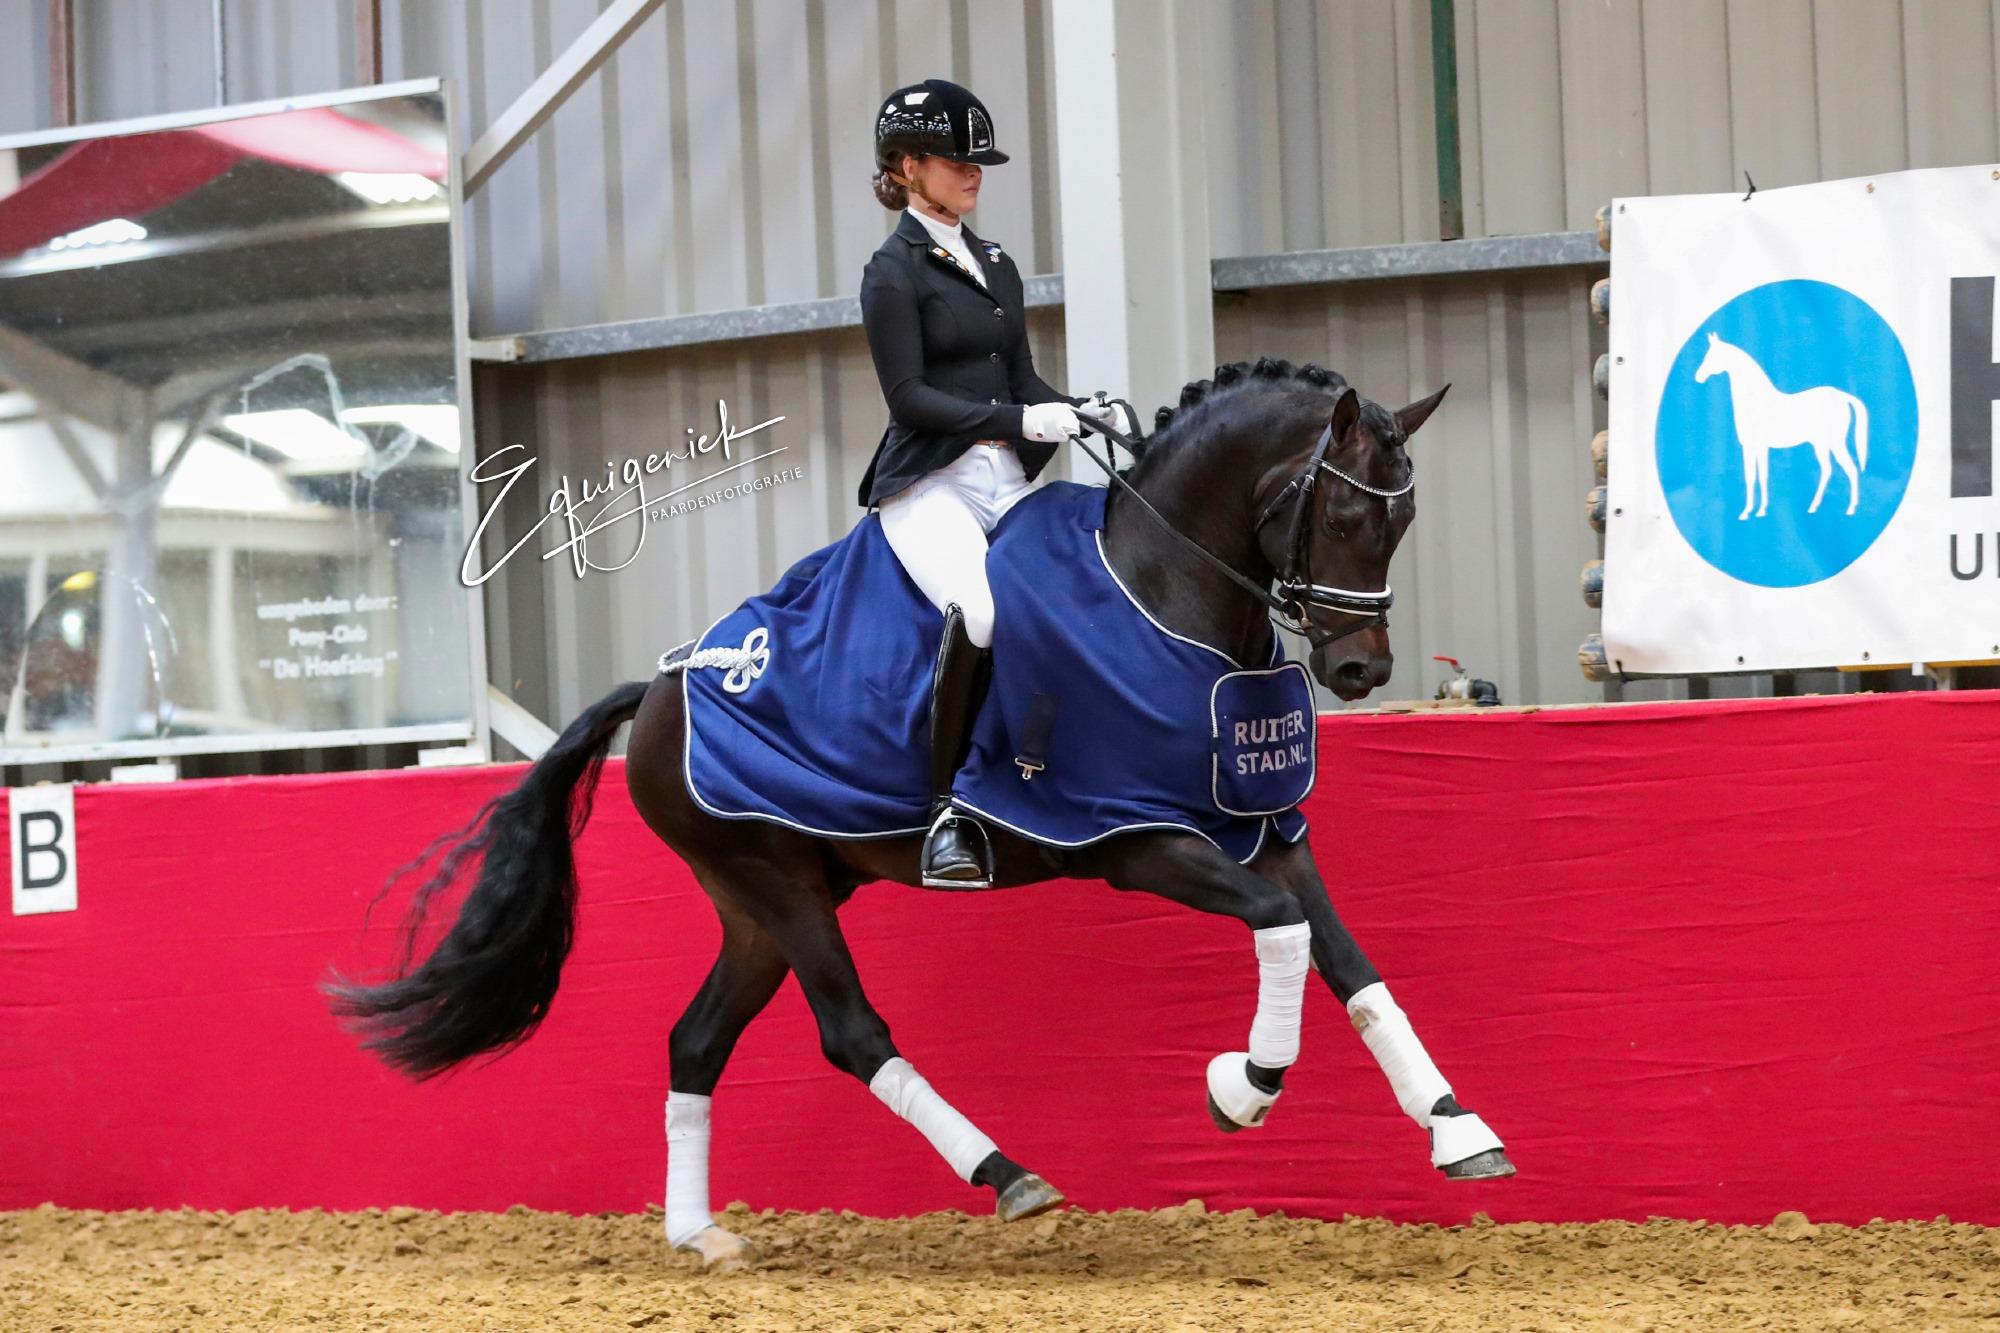 3-jr pony's Dempsy Sil Bo van Nimwegen